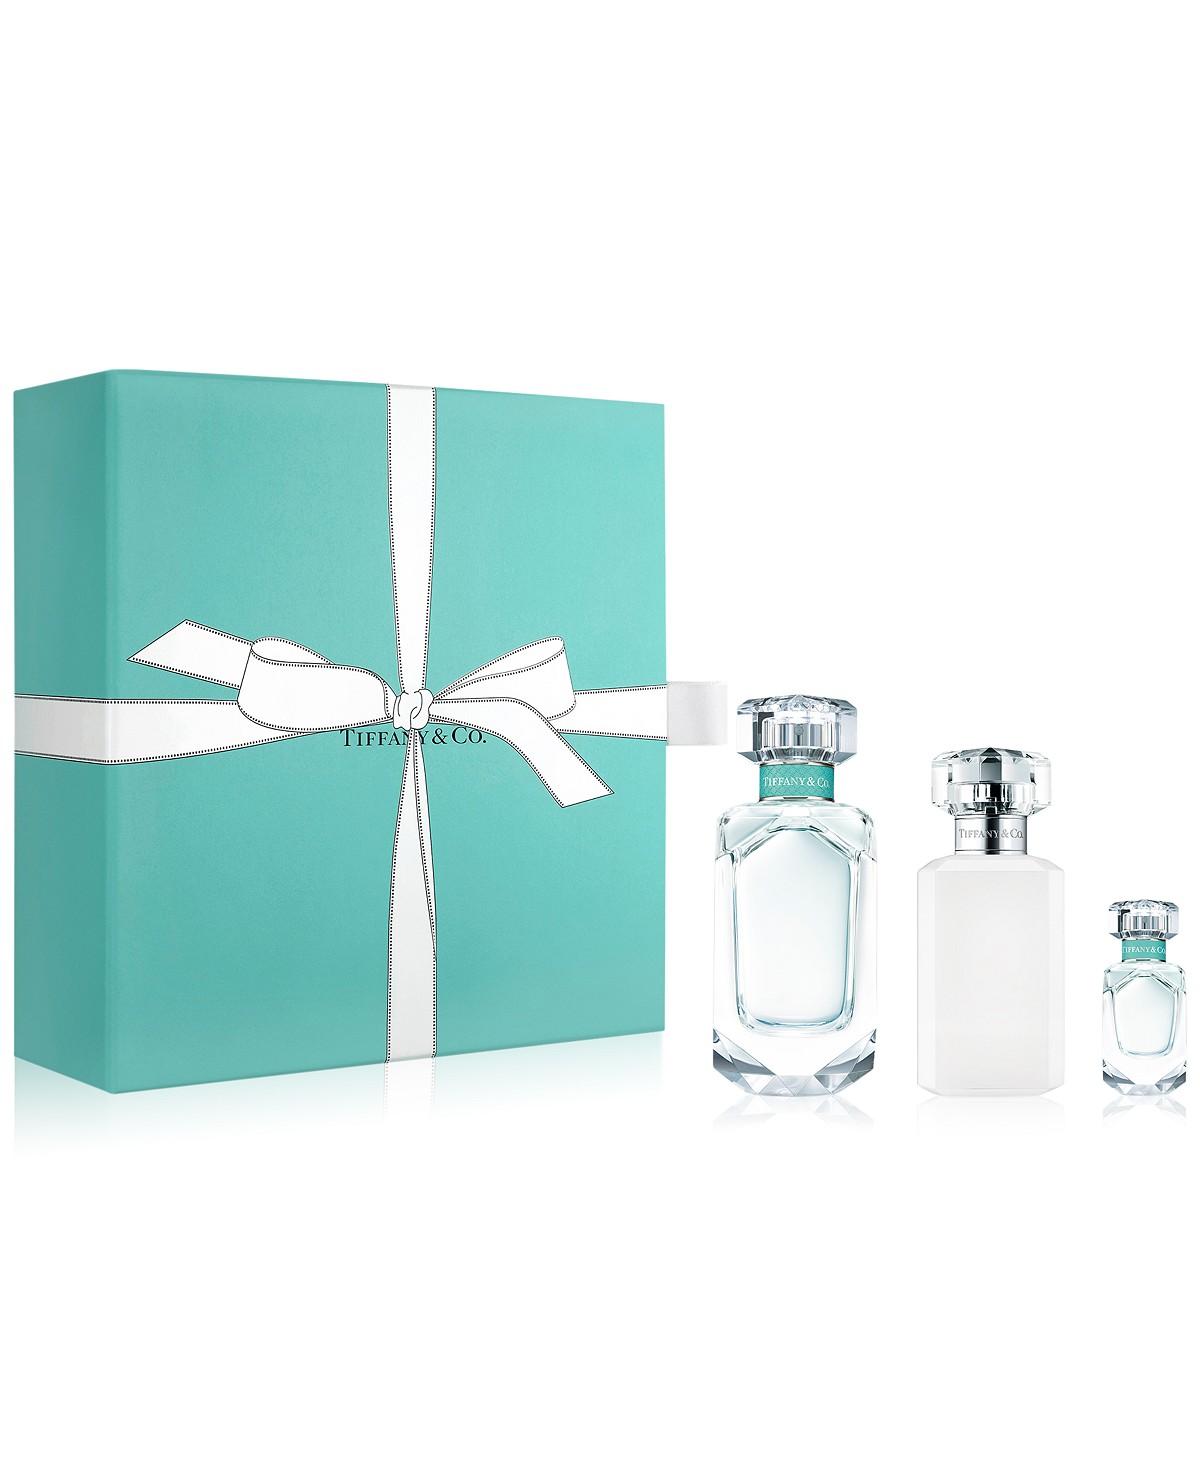 Tiffany & Co. 3-Pc. Gift Set, Created for Macy's | Hermosaz